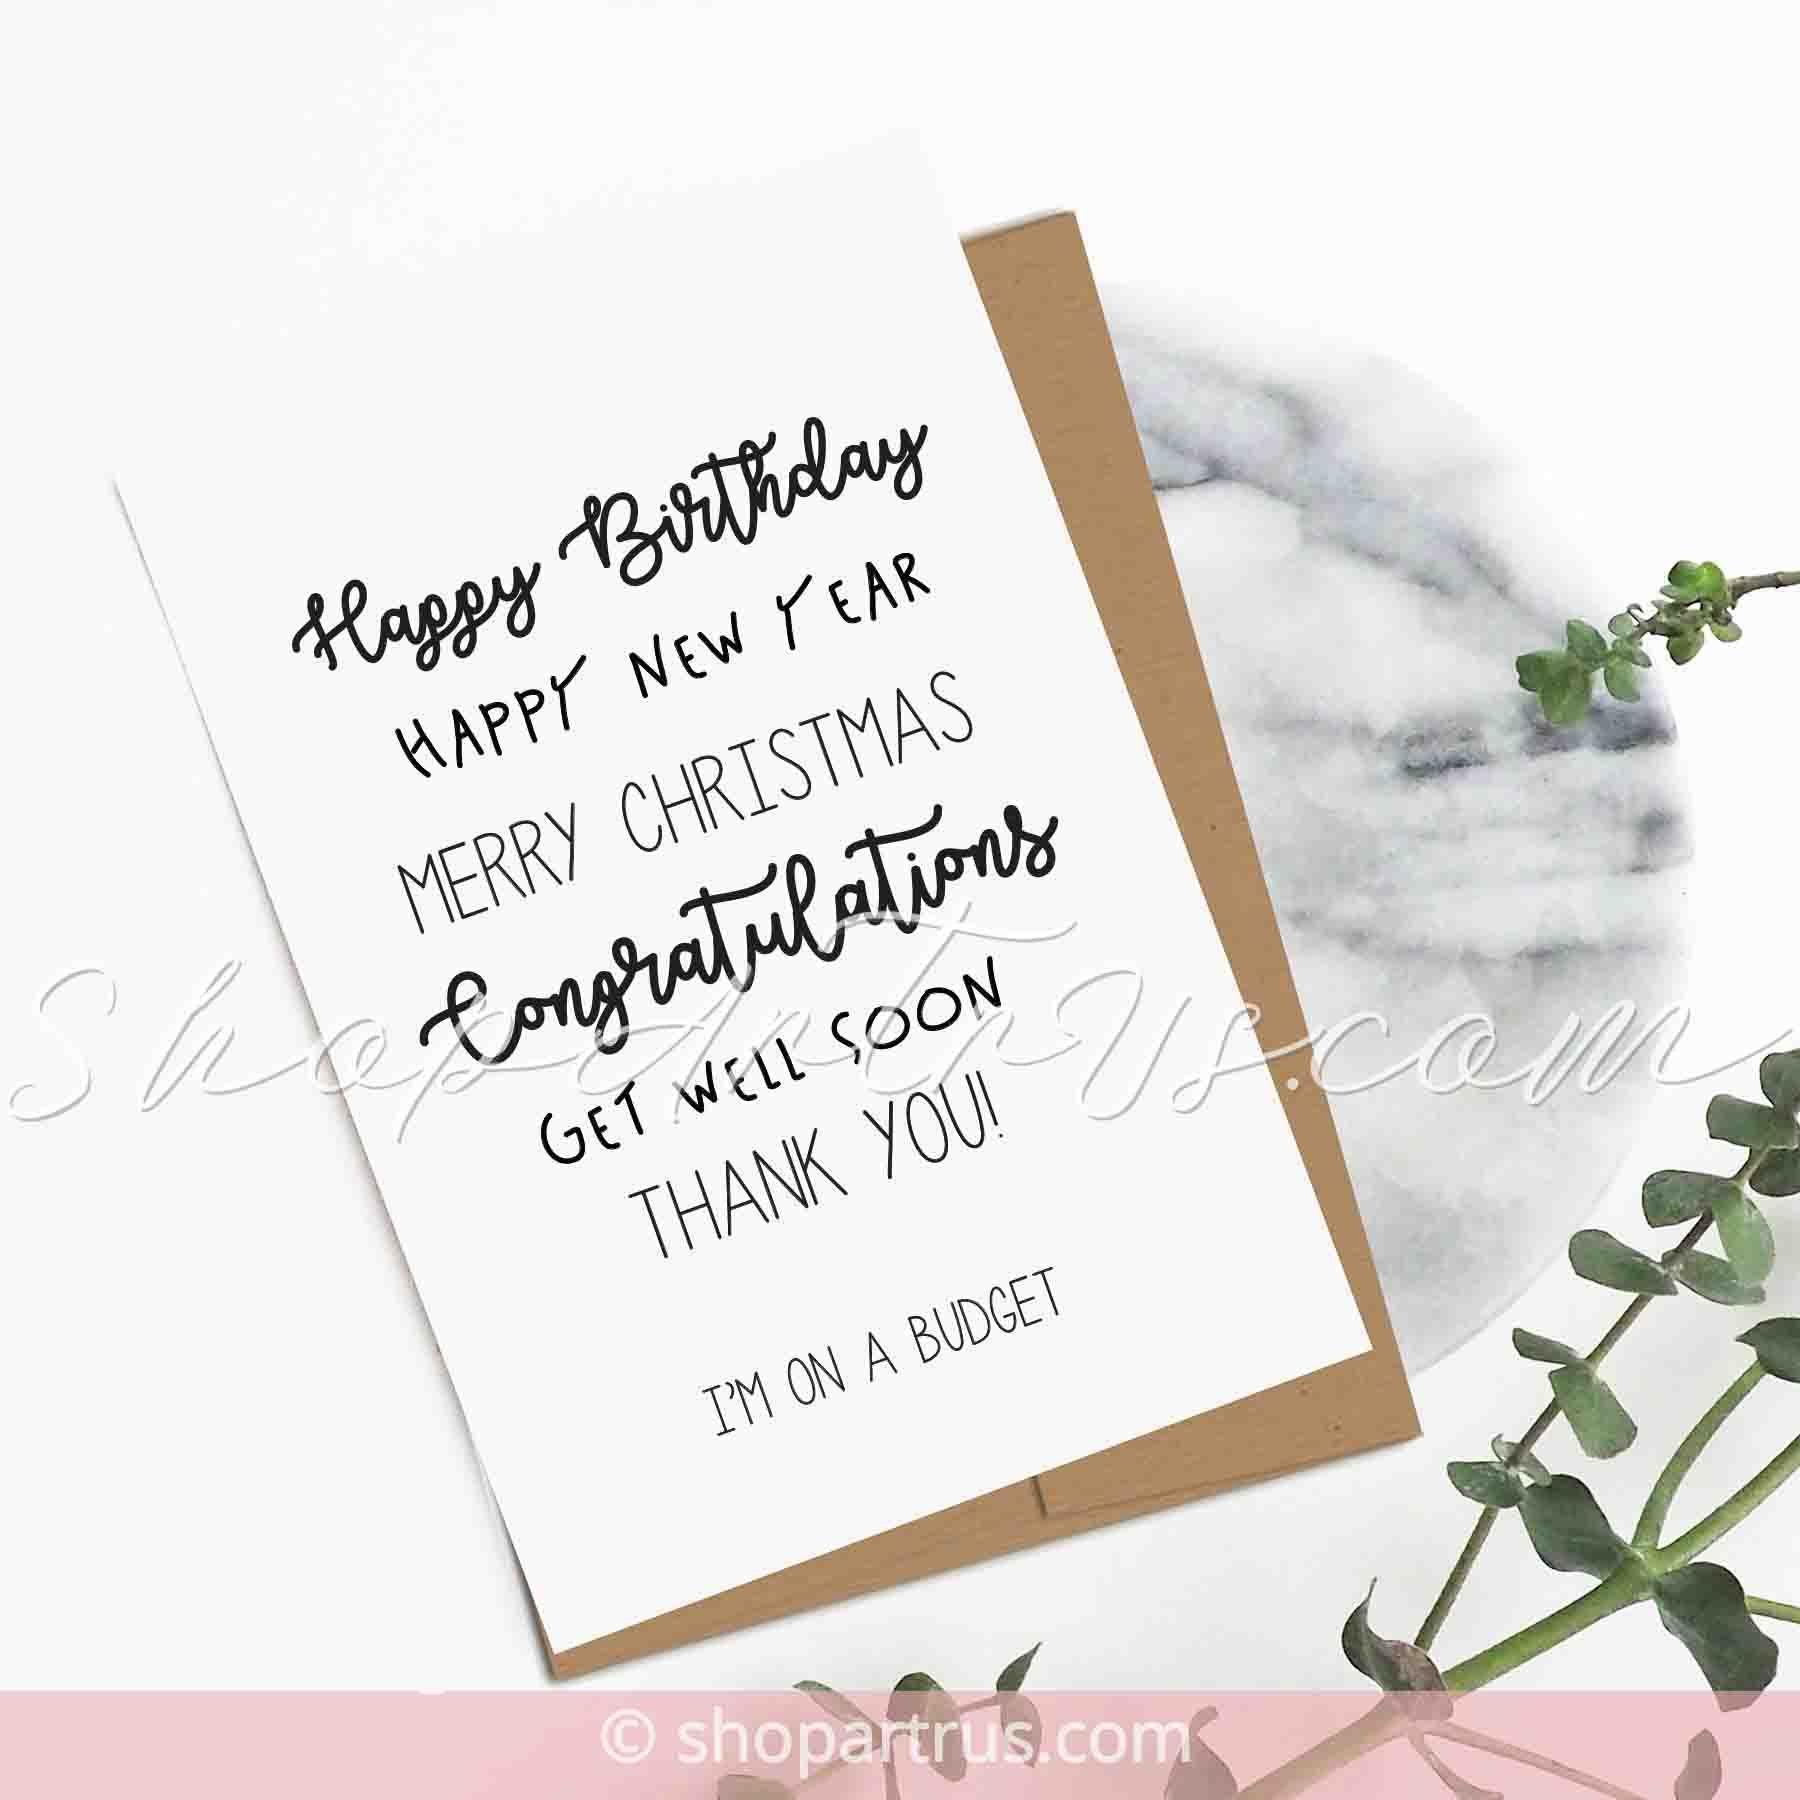 Best friend birthday funny happy birthday cards for boyfriend